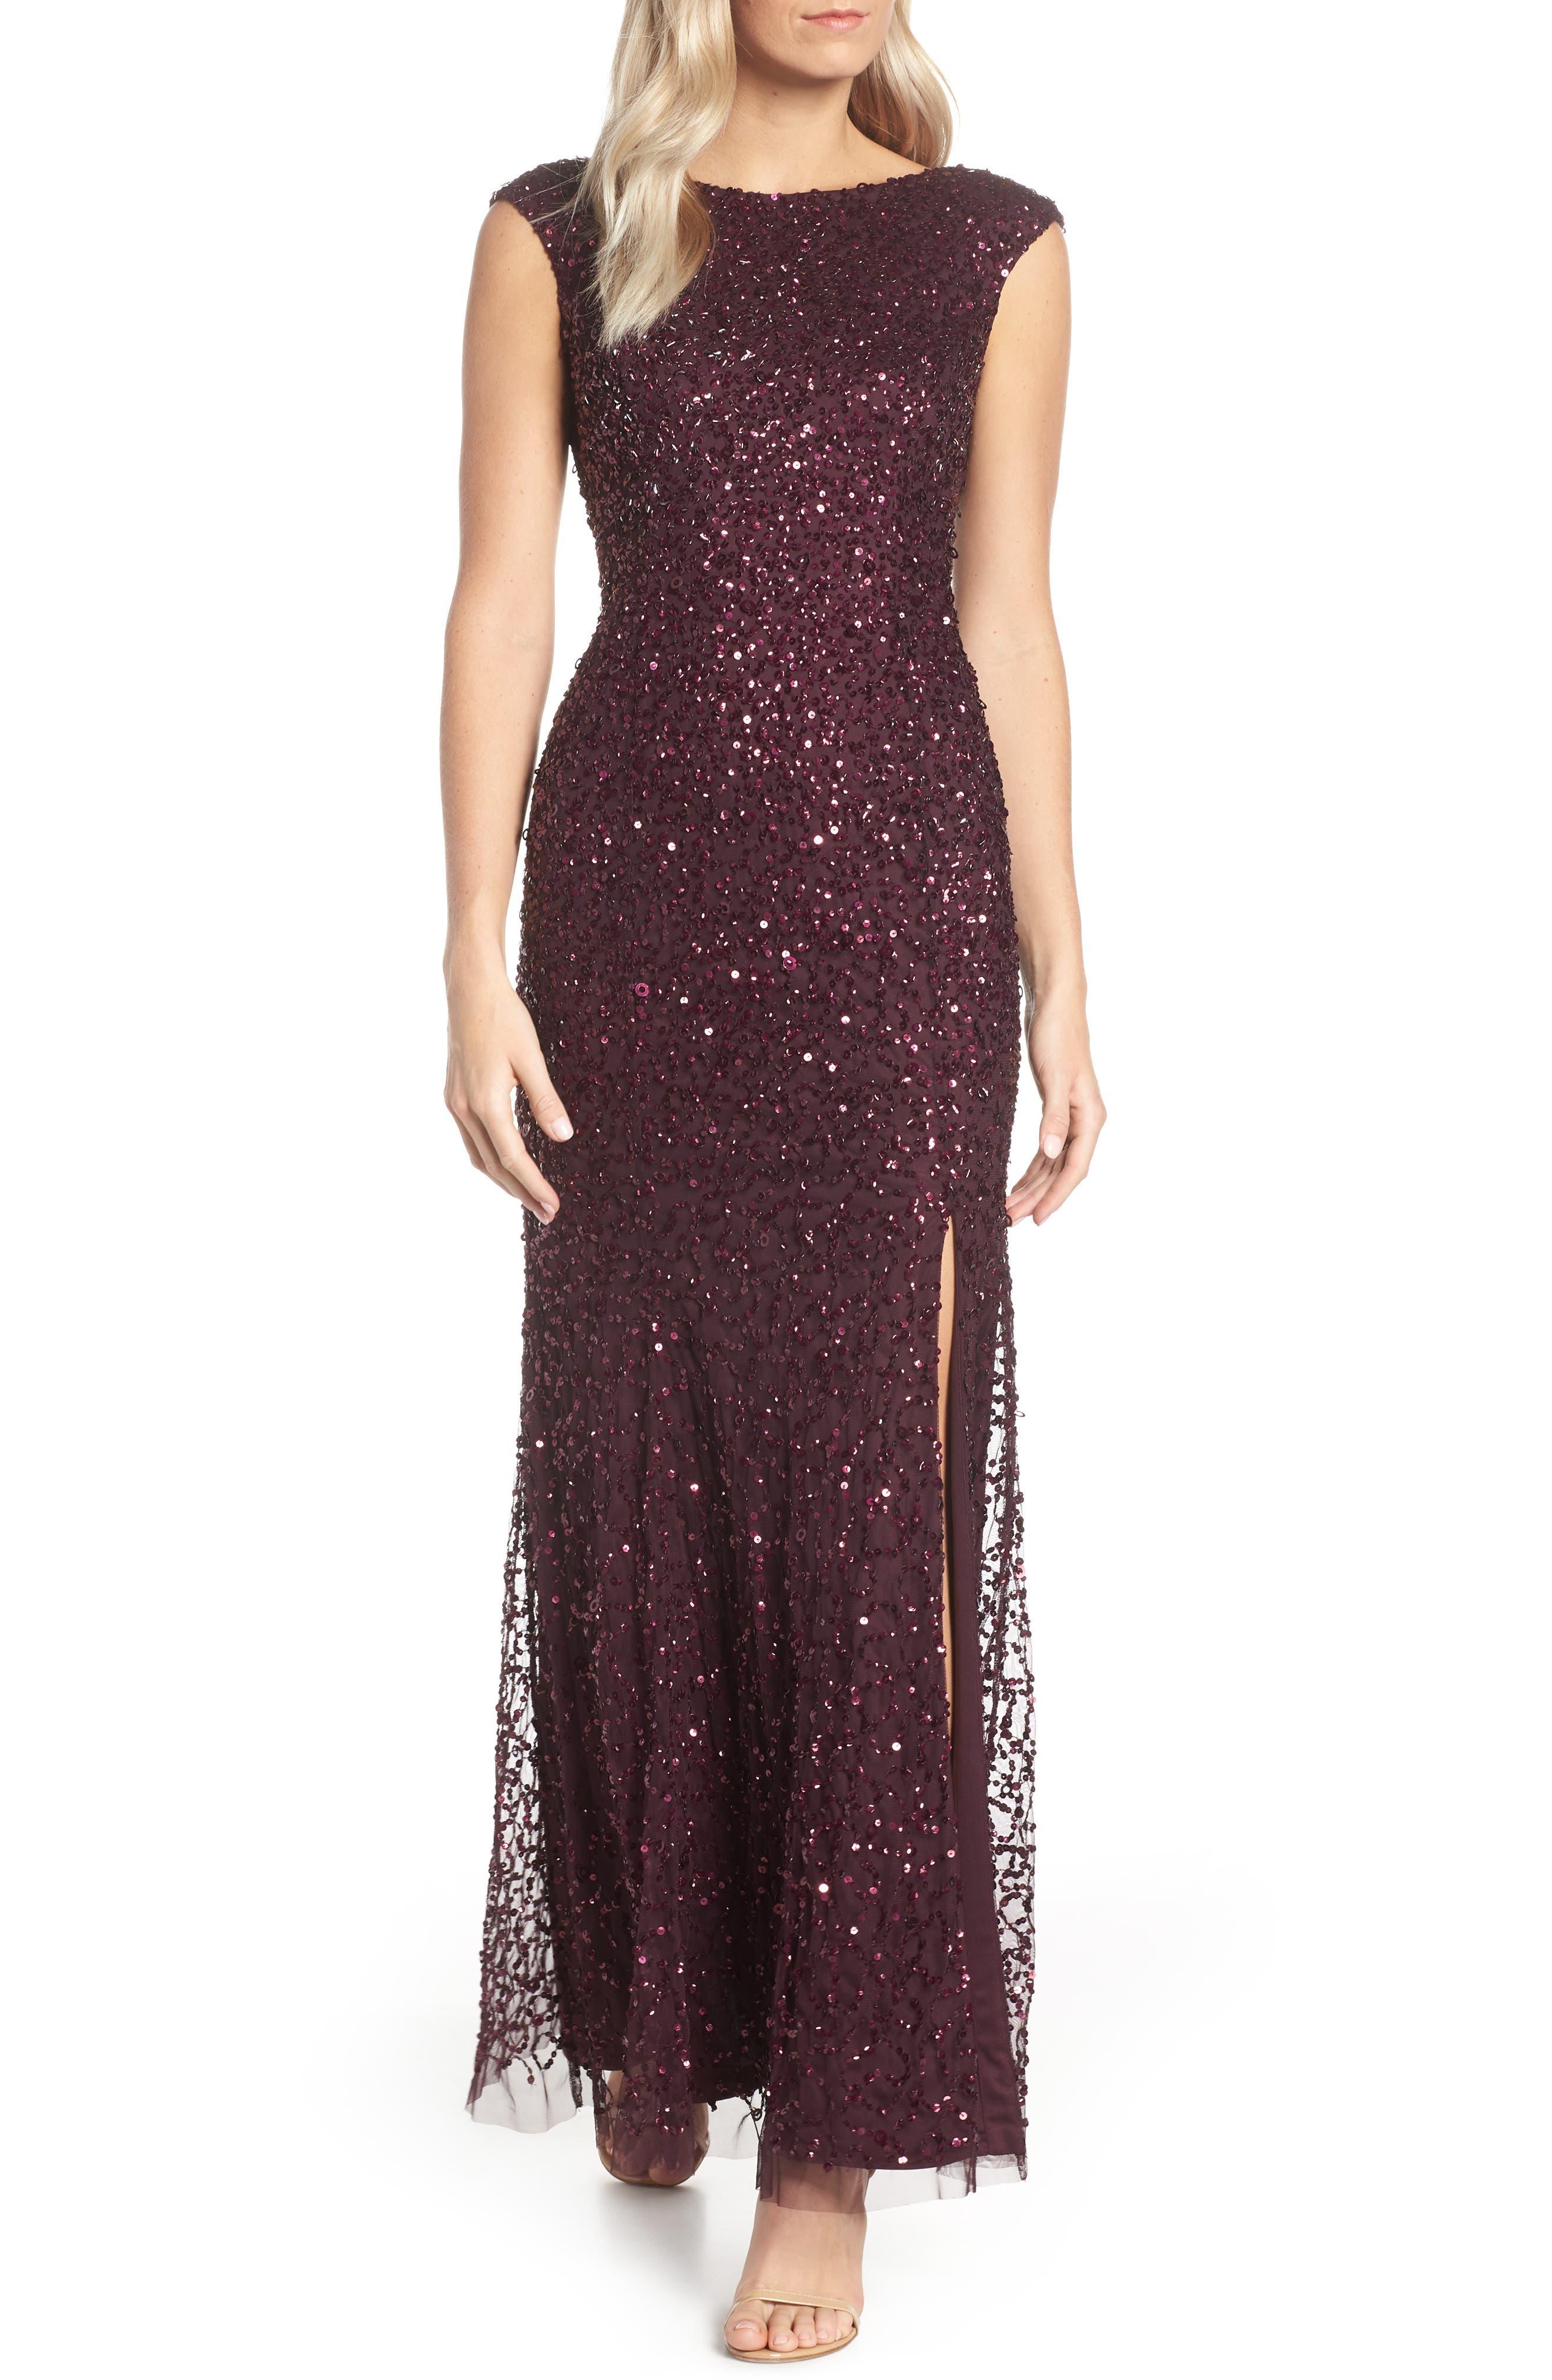 Sequin Evening Dress,                             Main thumbnail 1, color,                             NIGHT PLUM